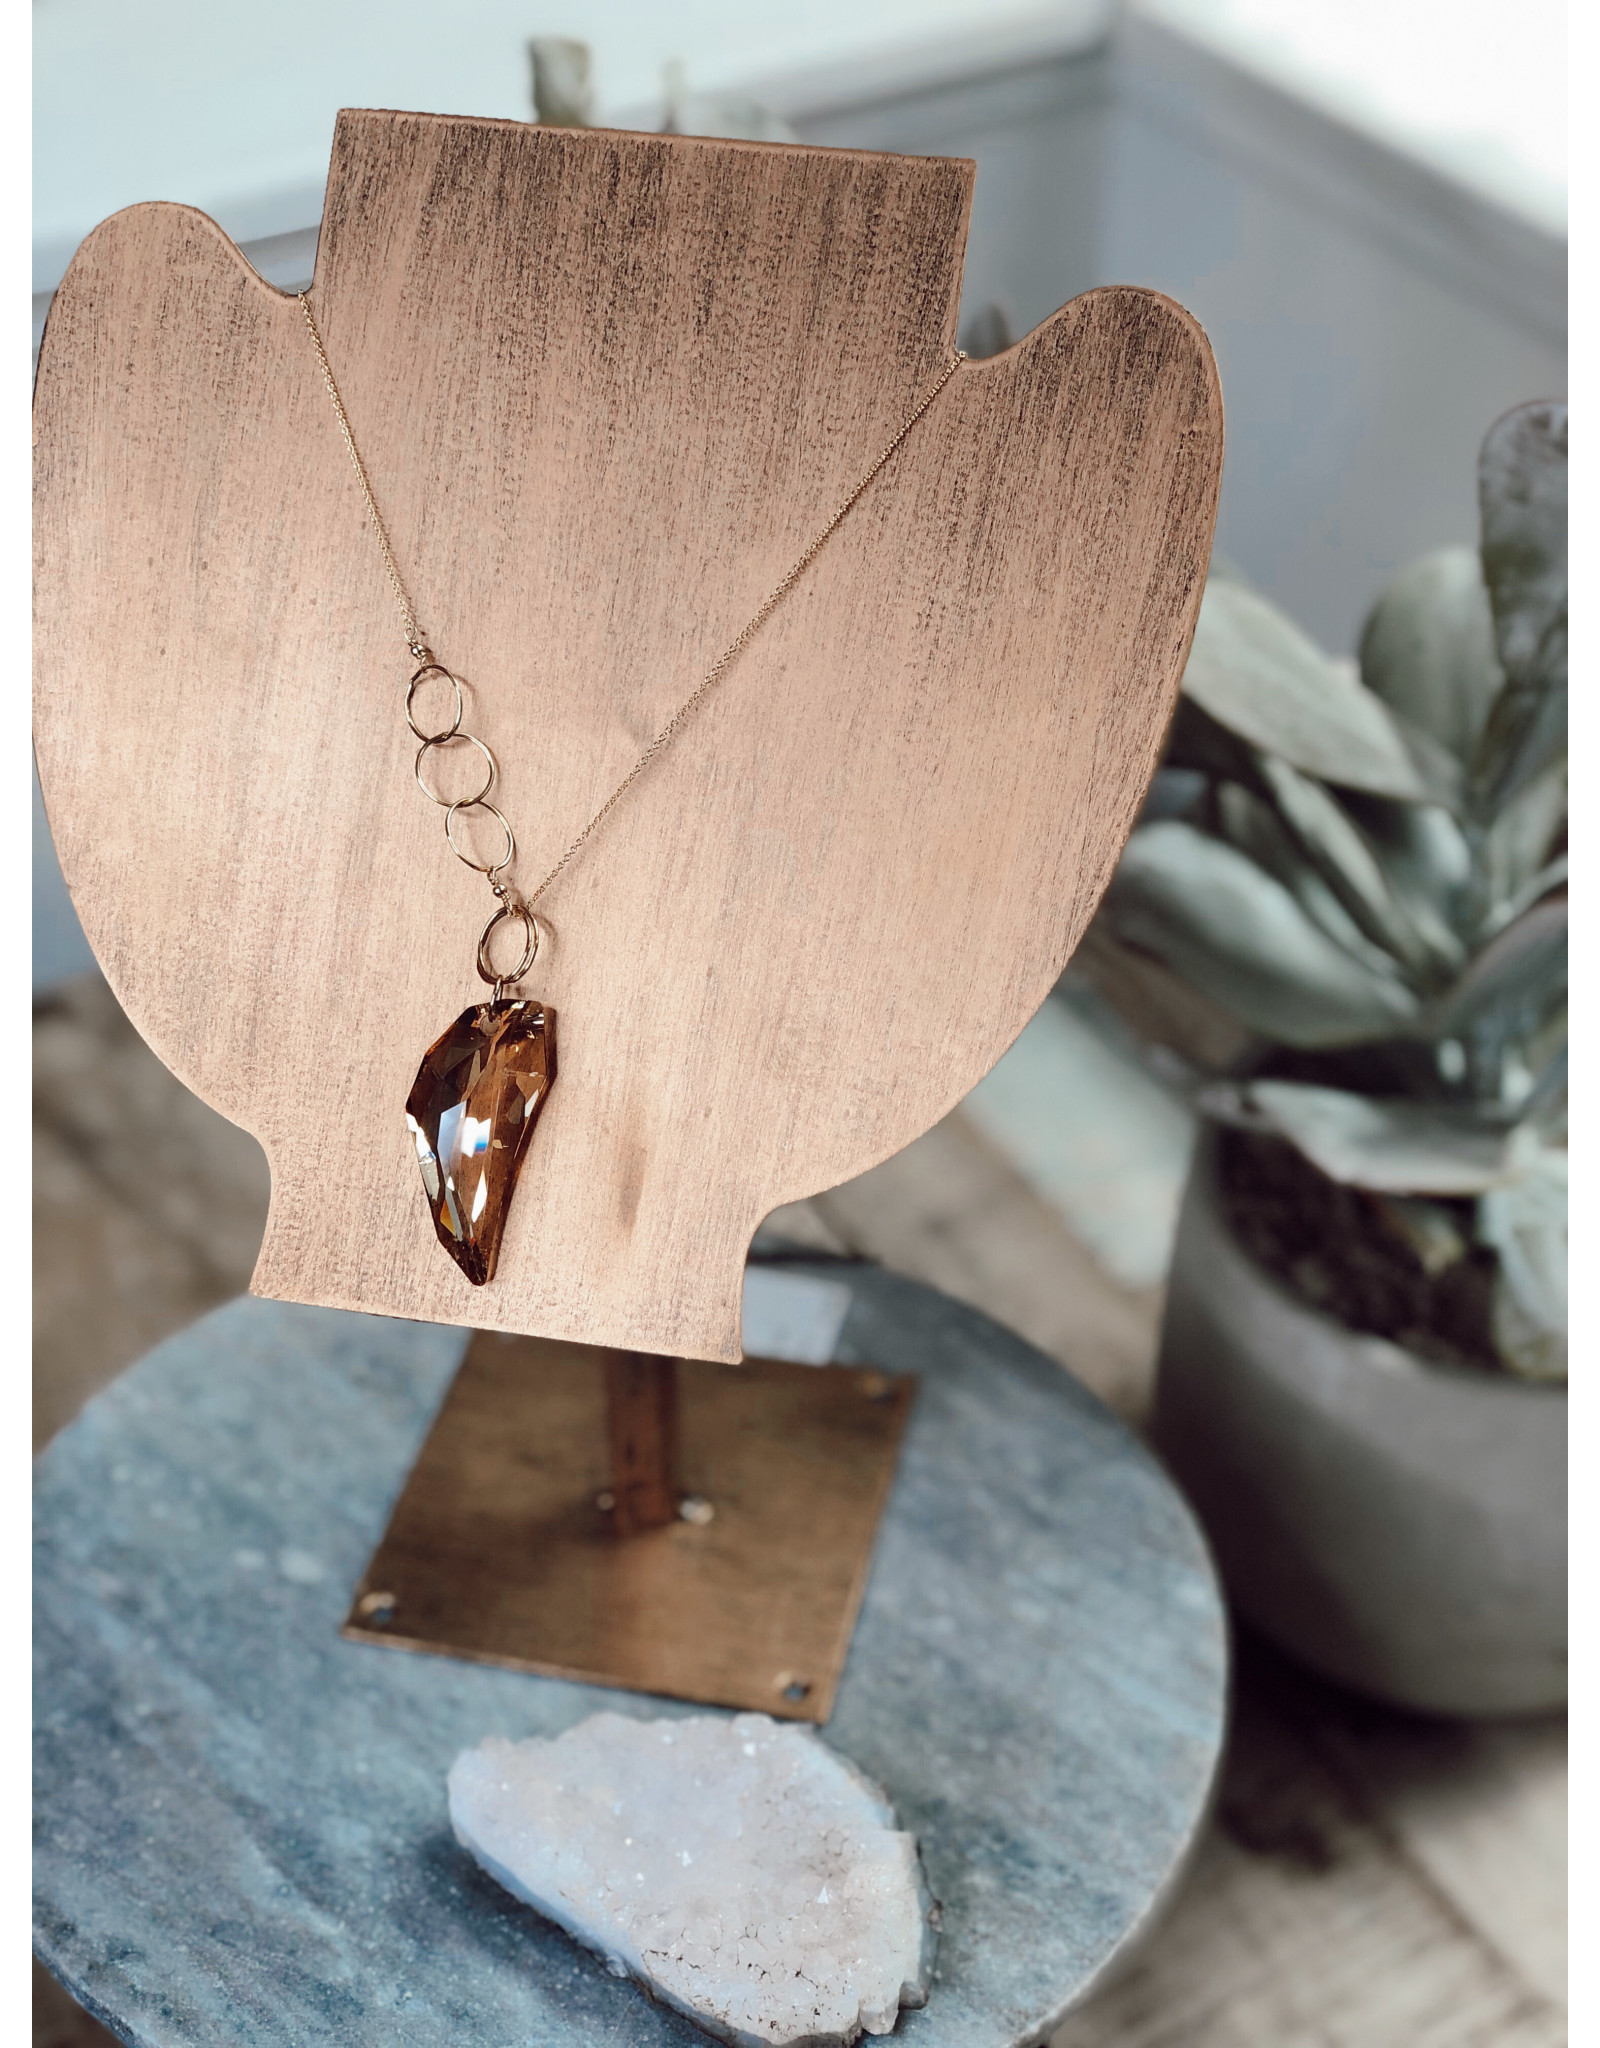 Helen Wang HW Swarovski Wing Necklace